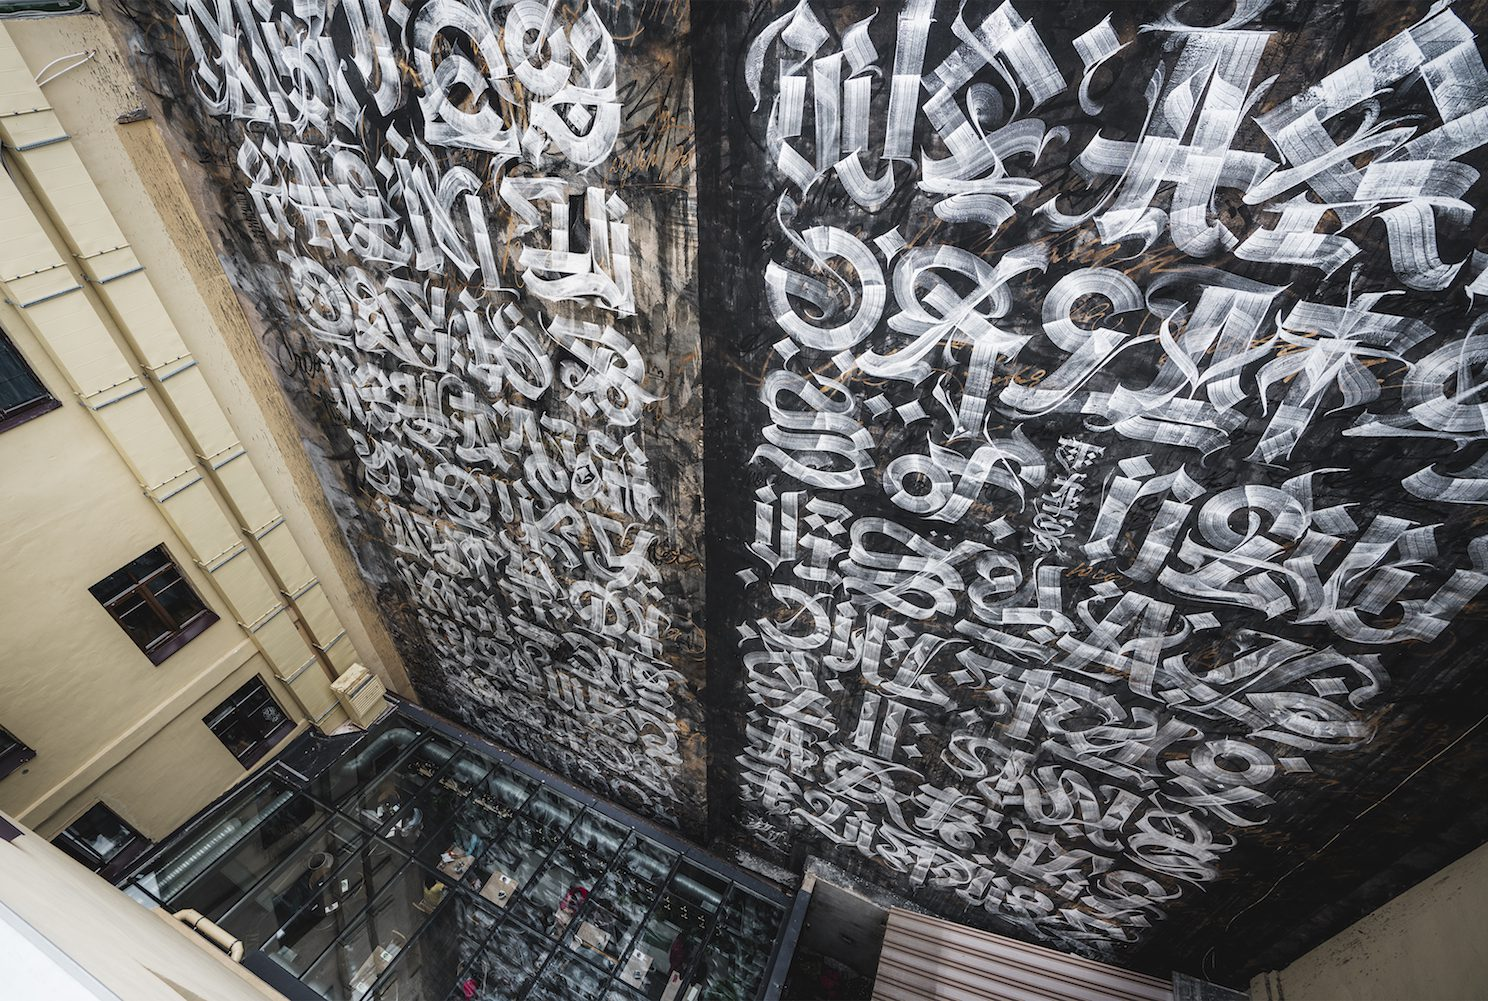 граффити мурал надписи стена надпись